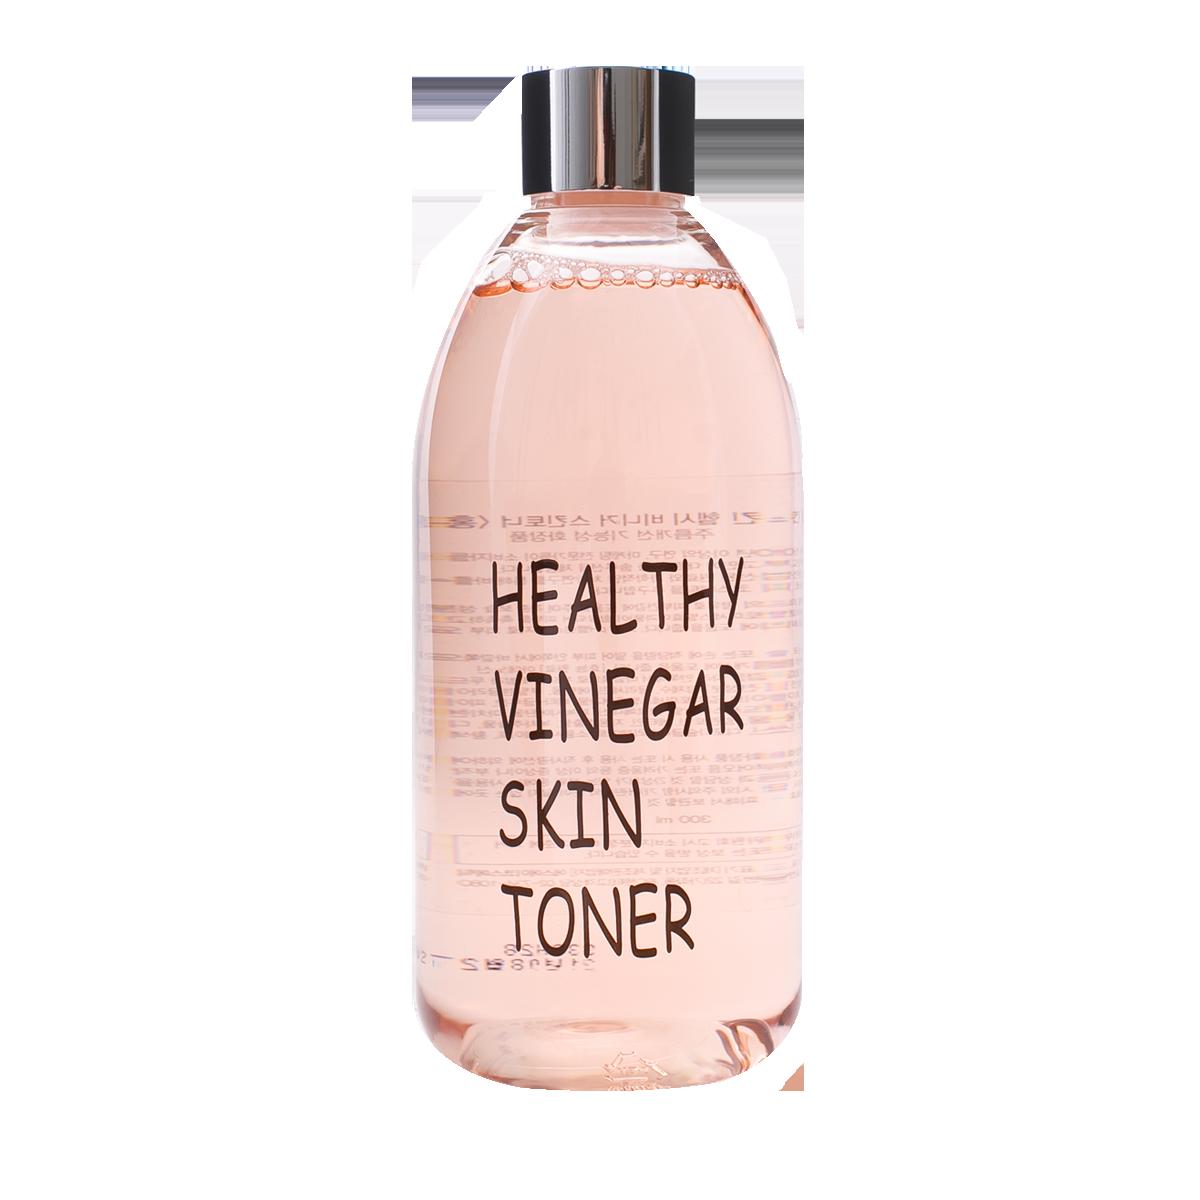 Тонер для лица КРАСНЫЙ ЖЕНЬШЕНЬ Healthy vinegar skin toner REALSKIN